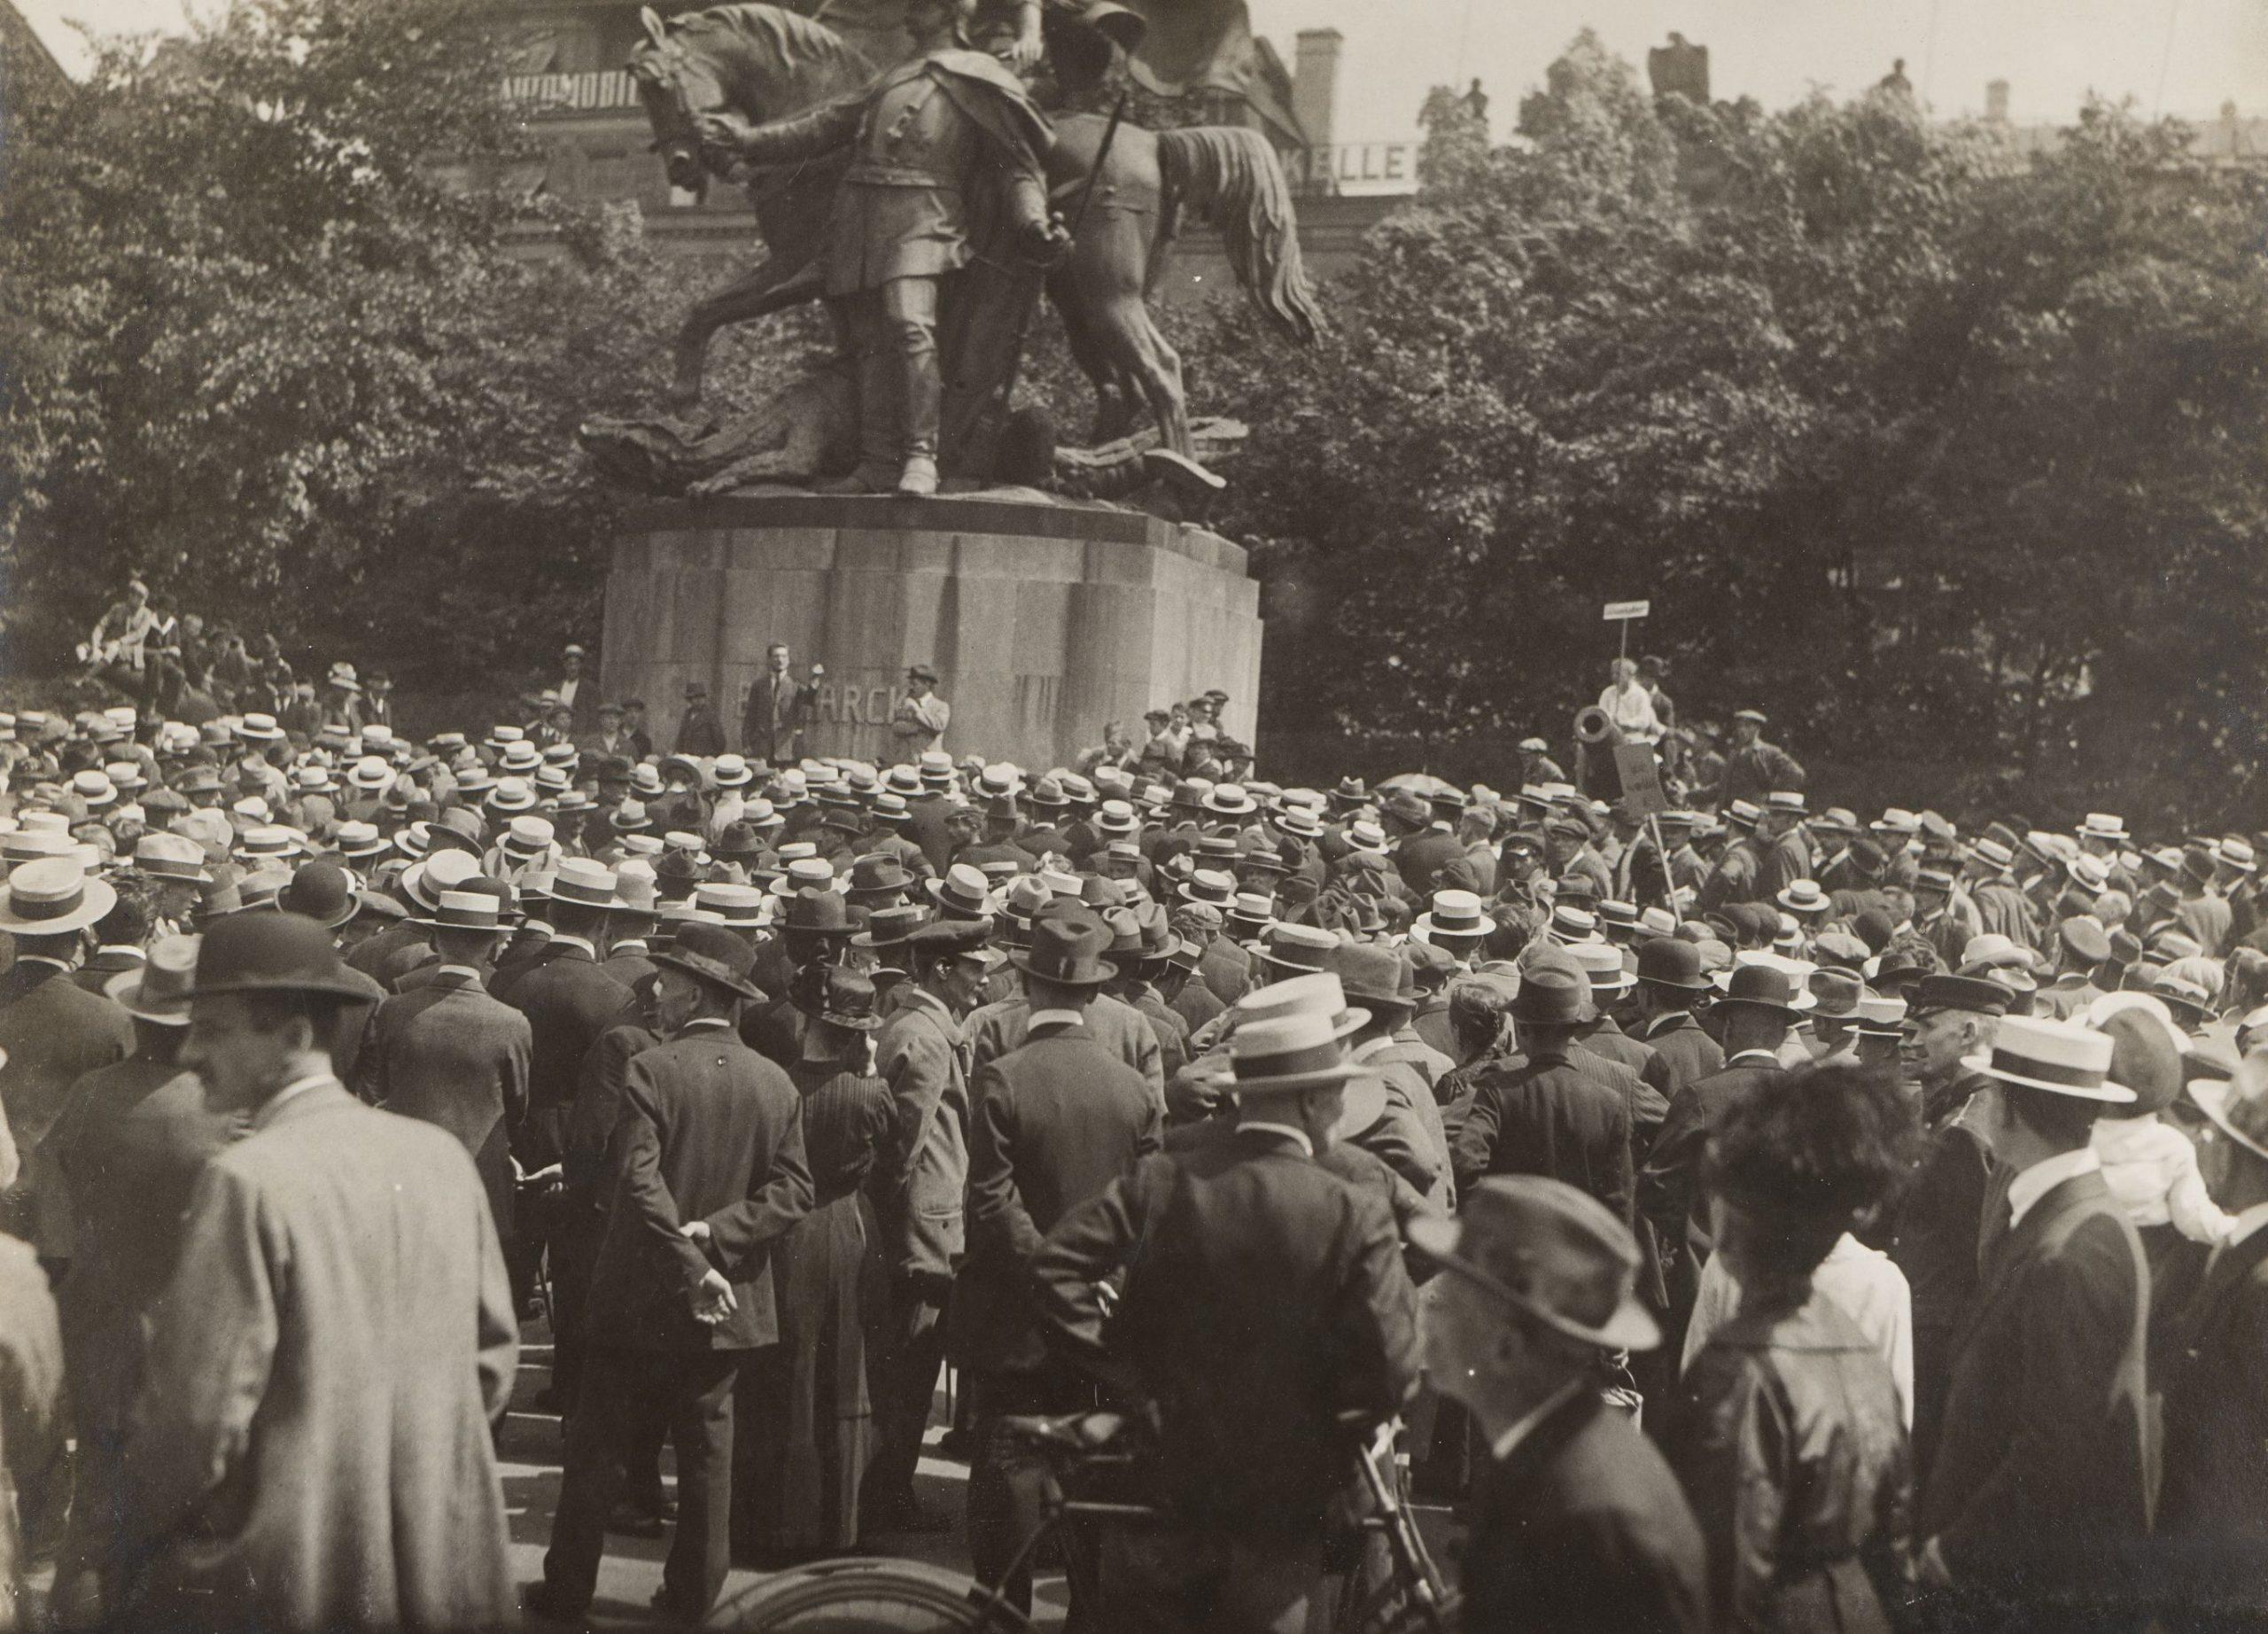 Crowd commemorating Rosa Luxemburg's funeral, Frankfurt 1919